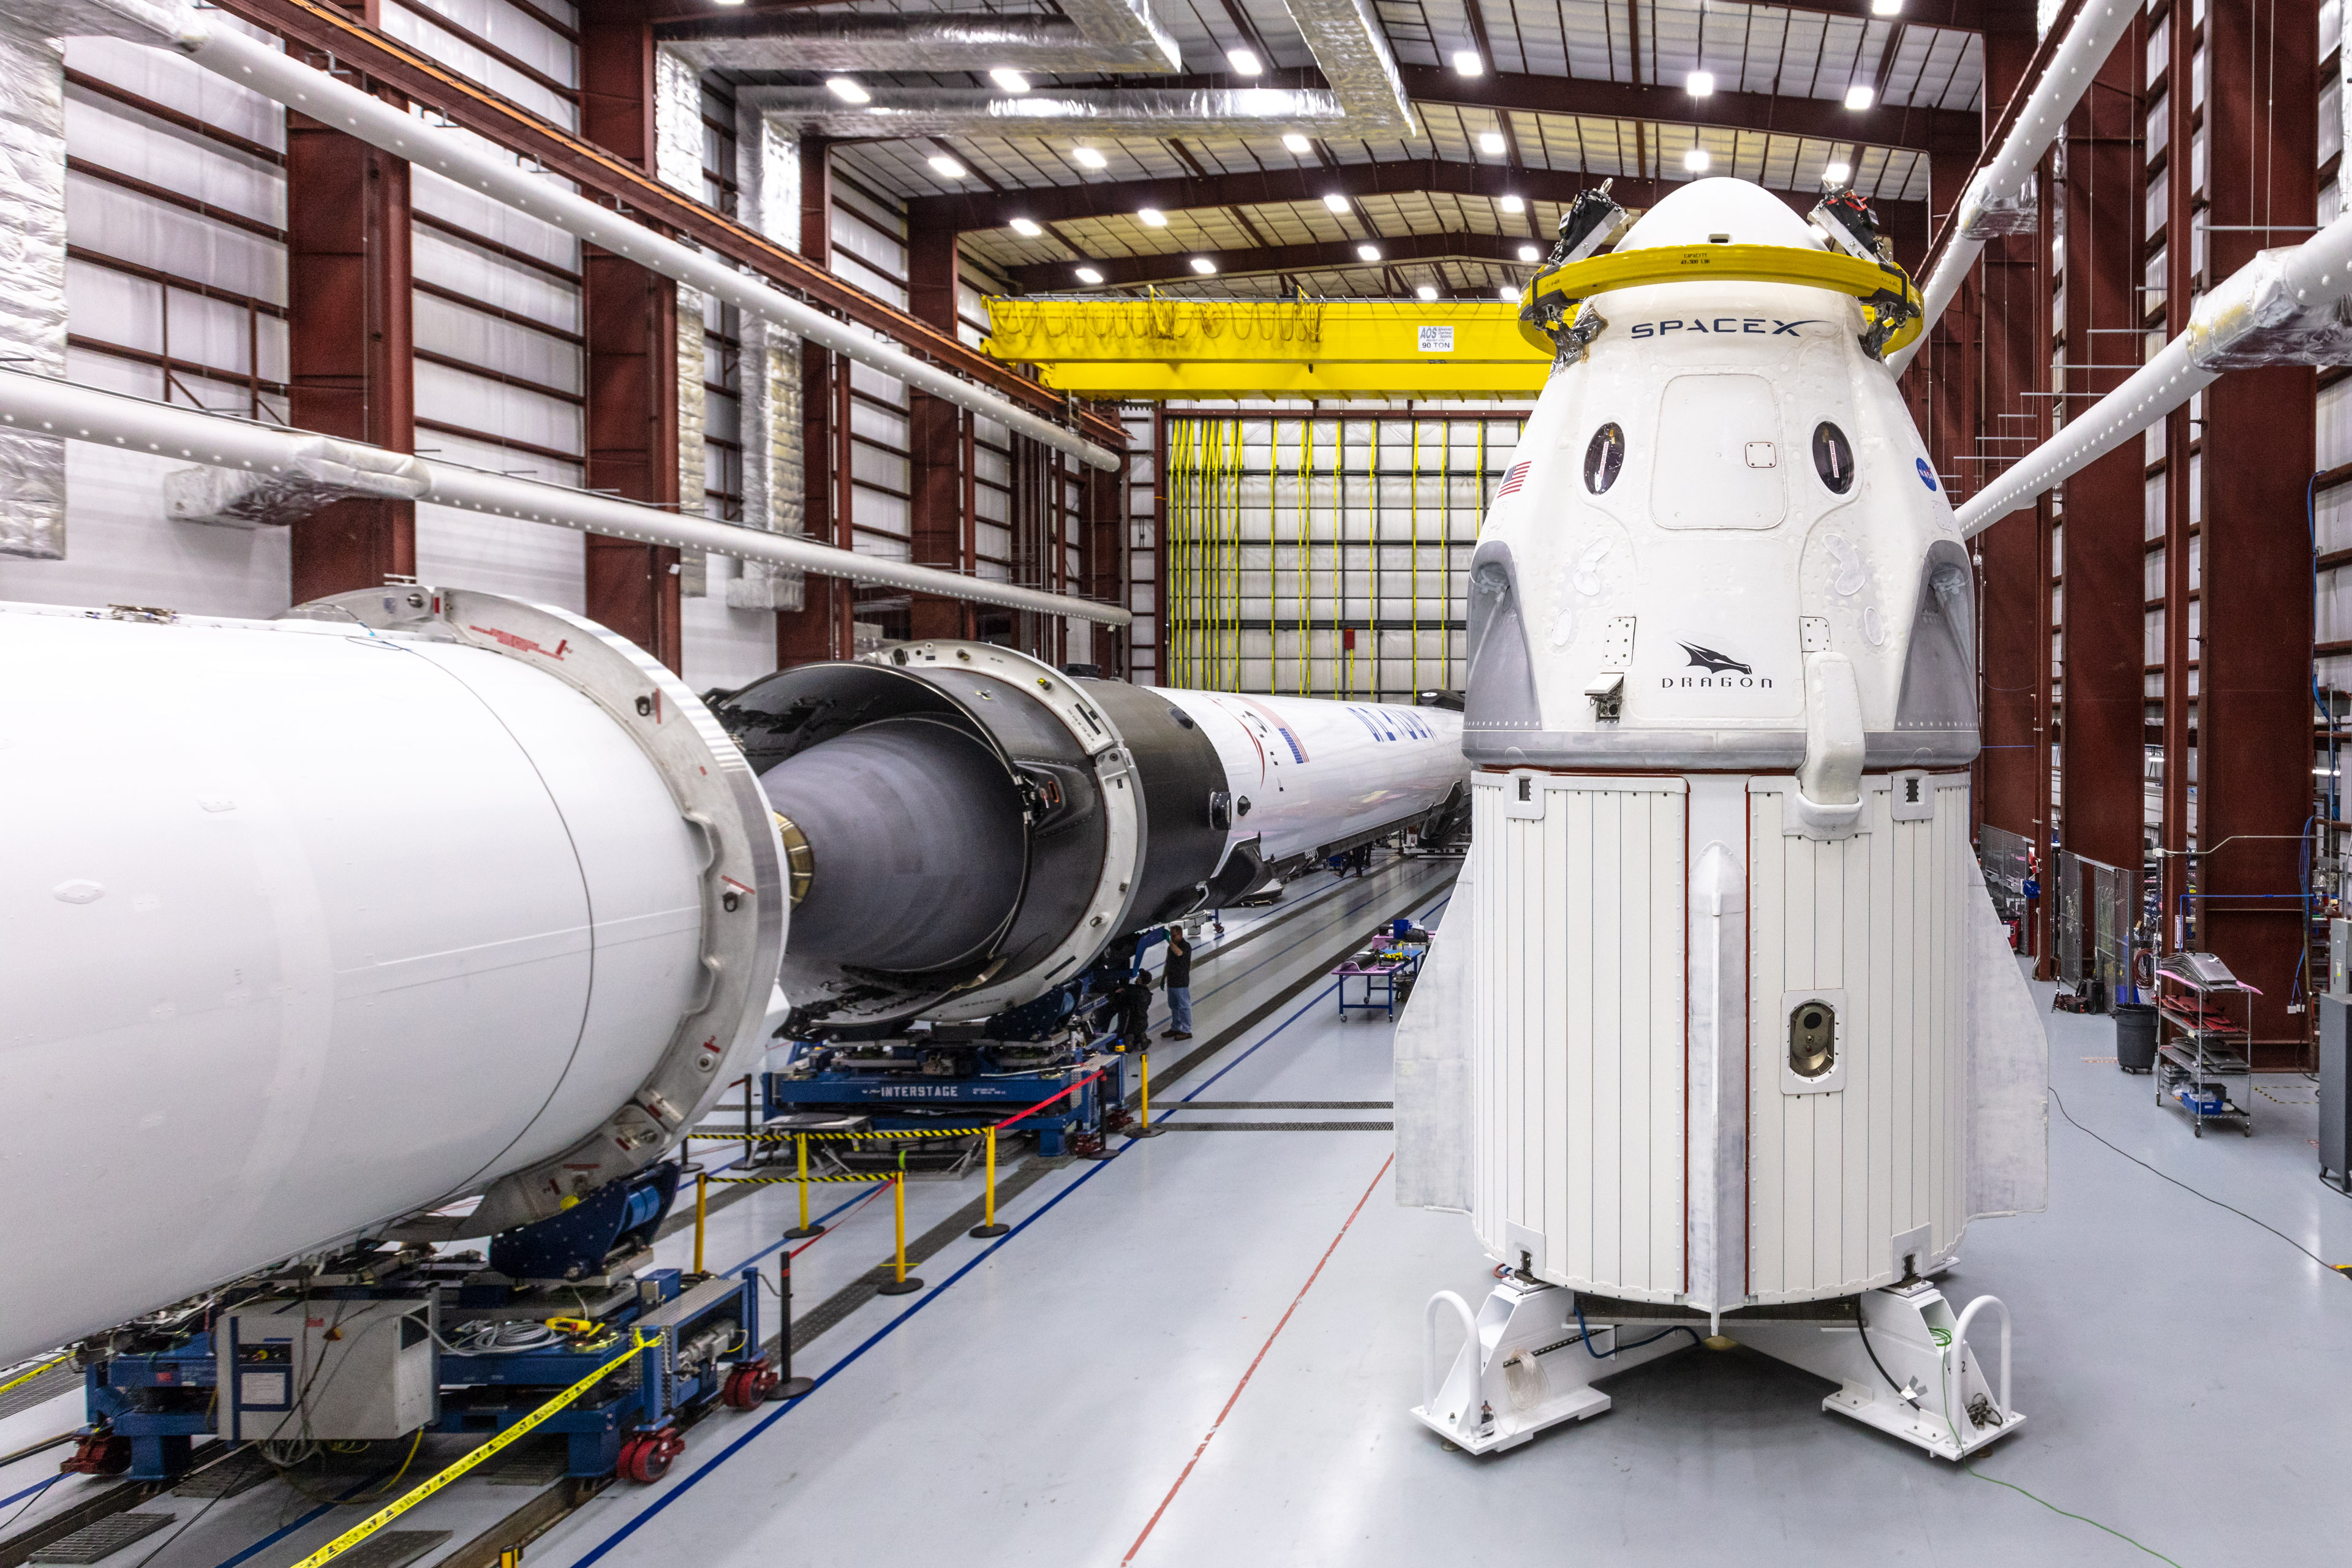 SpaceX's Crew Dragon Spacecraft and Falcon 9 Rocket | NASA